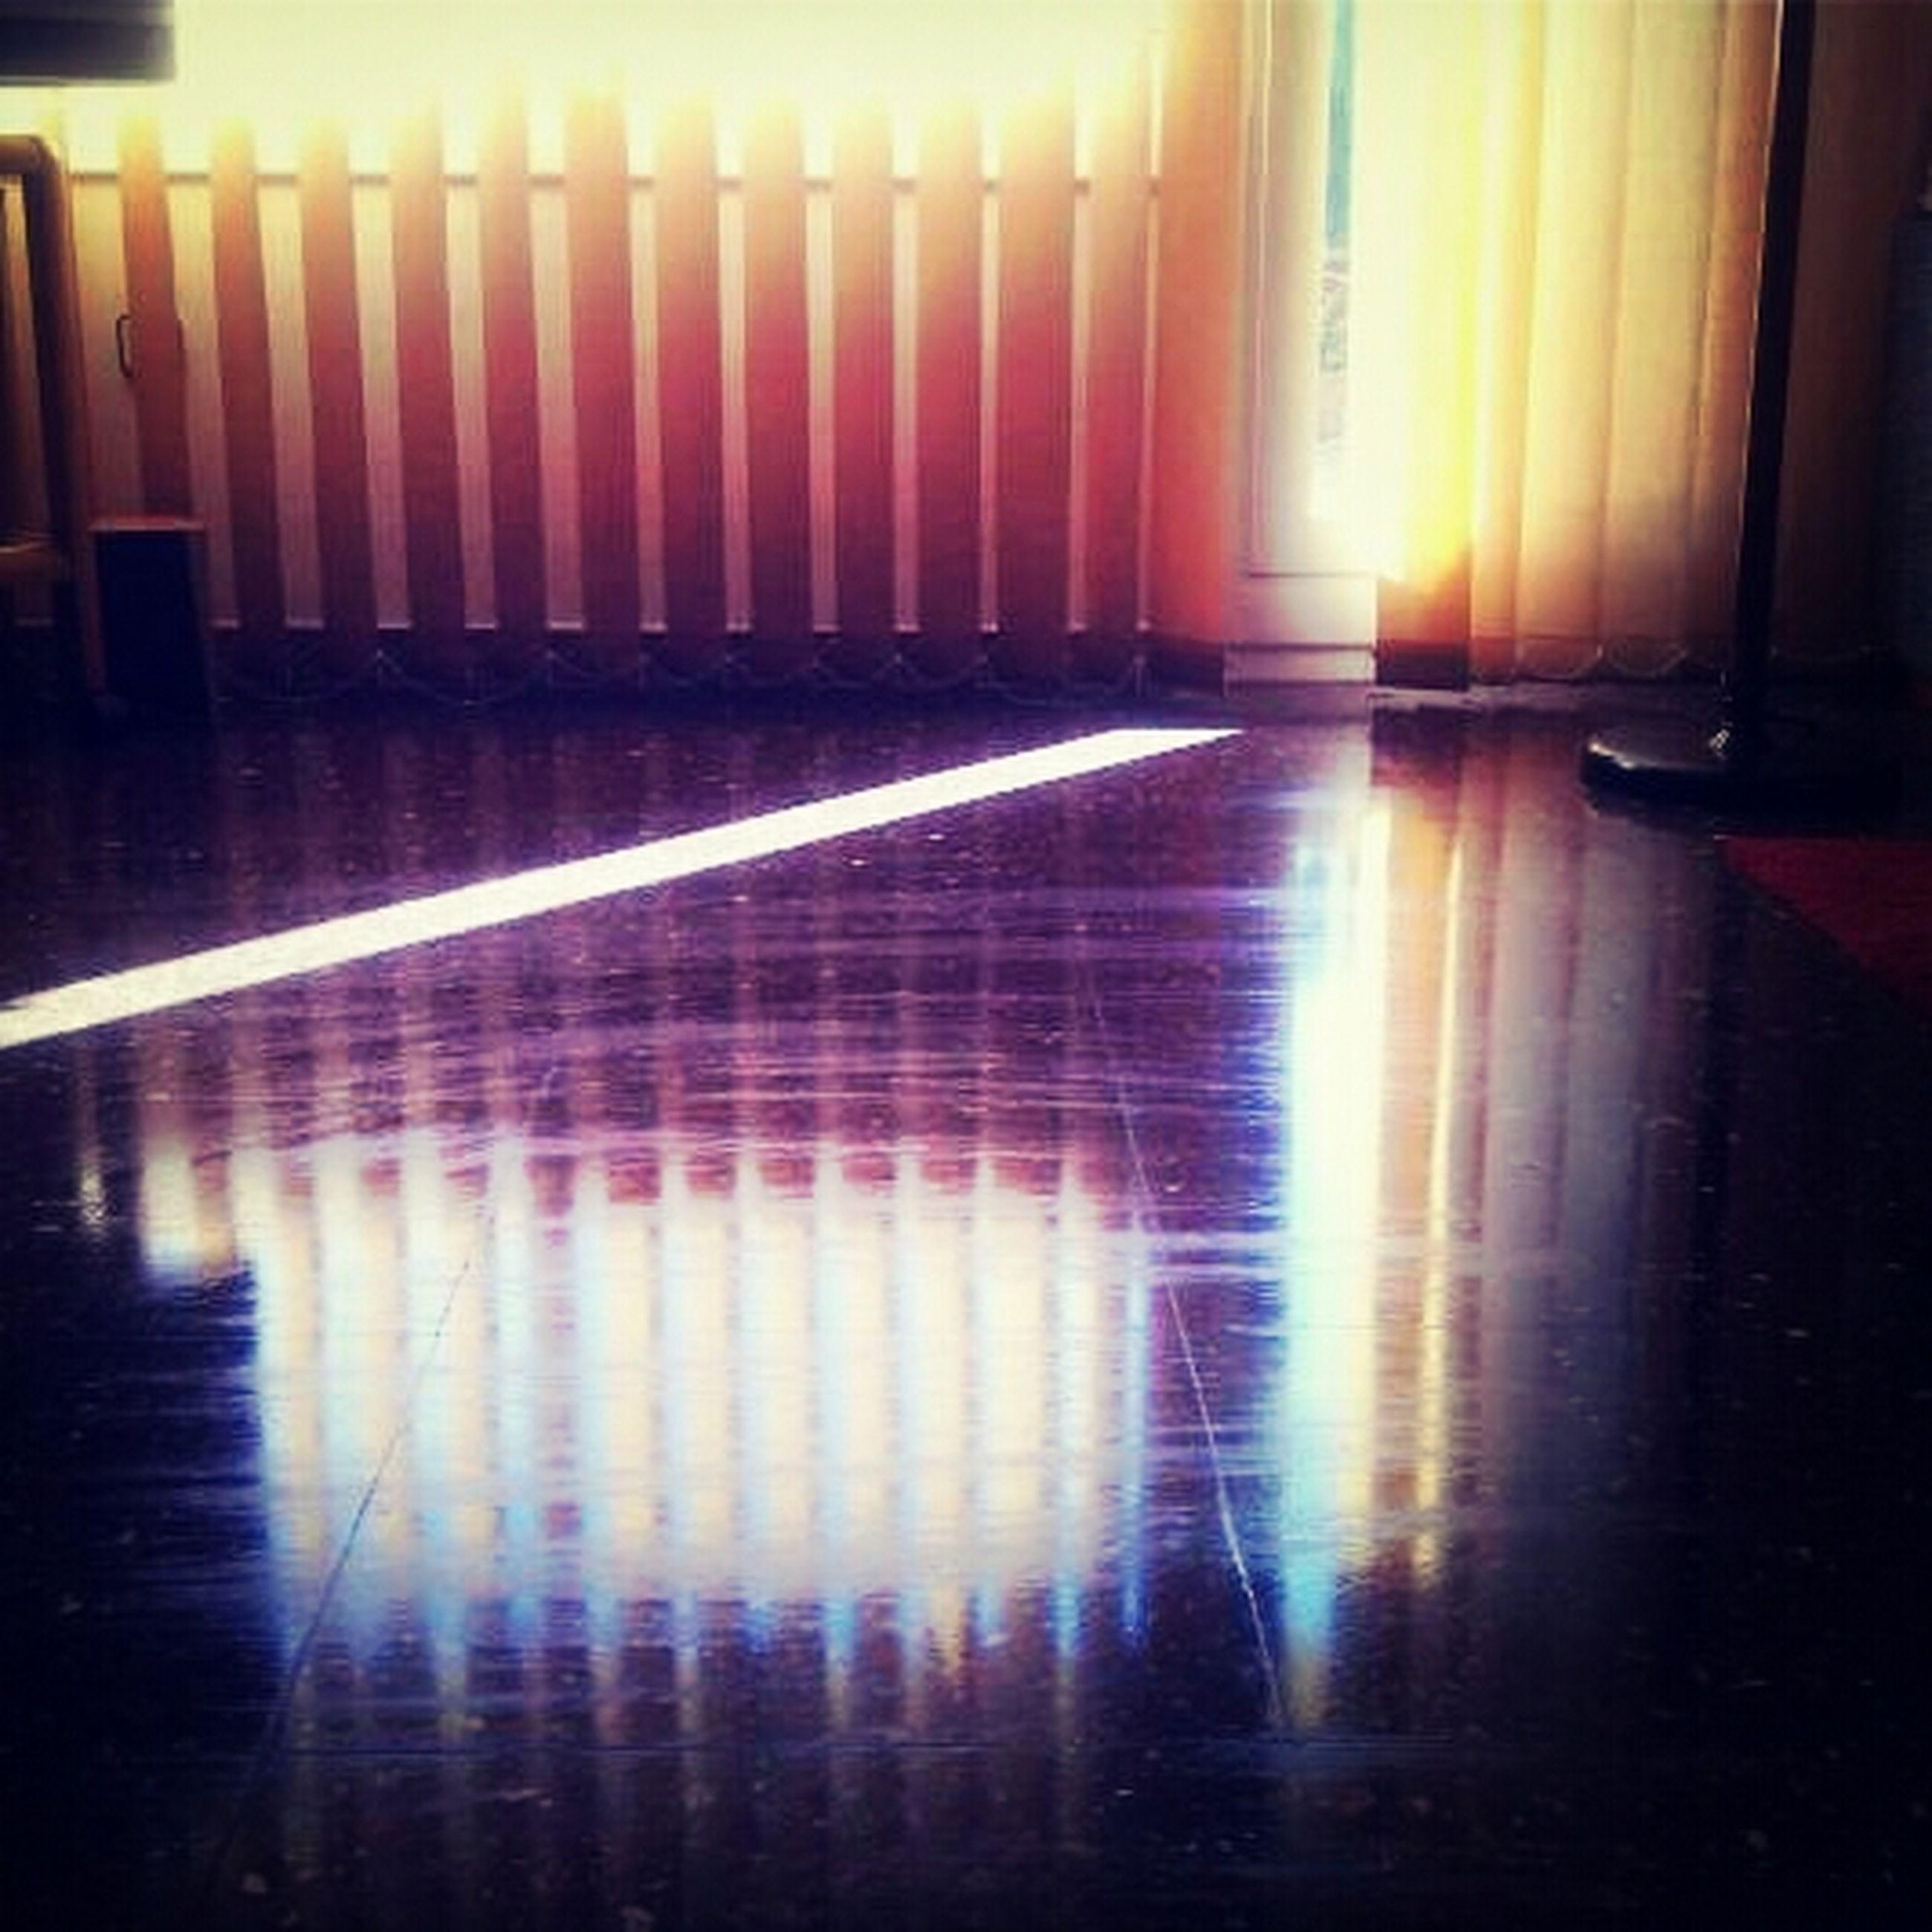 indoors, reflection, illuminated, sunlight, flooring, lens flare, built structure, sun, sunset, empty, sunbeam, light - natural phenomenon, shadow, architecture, no people, window, orange color, lighting equipment, glowing, silhouette